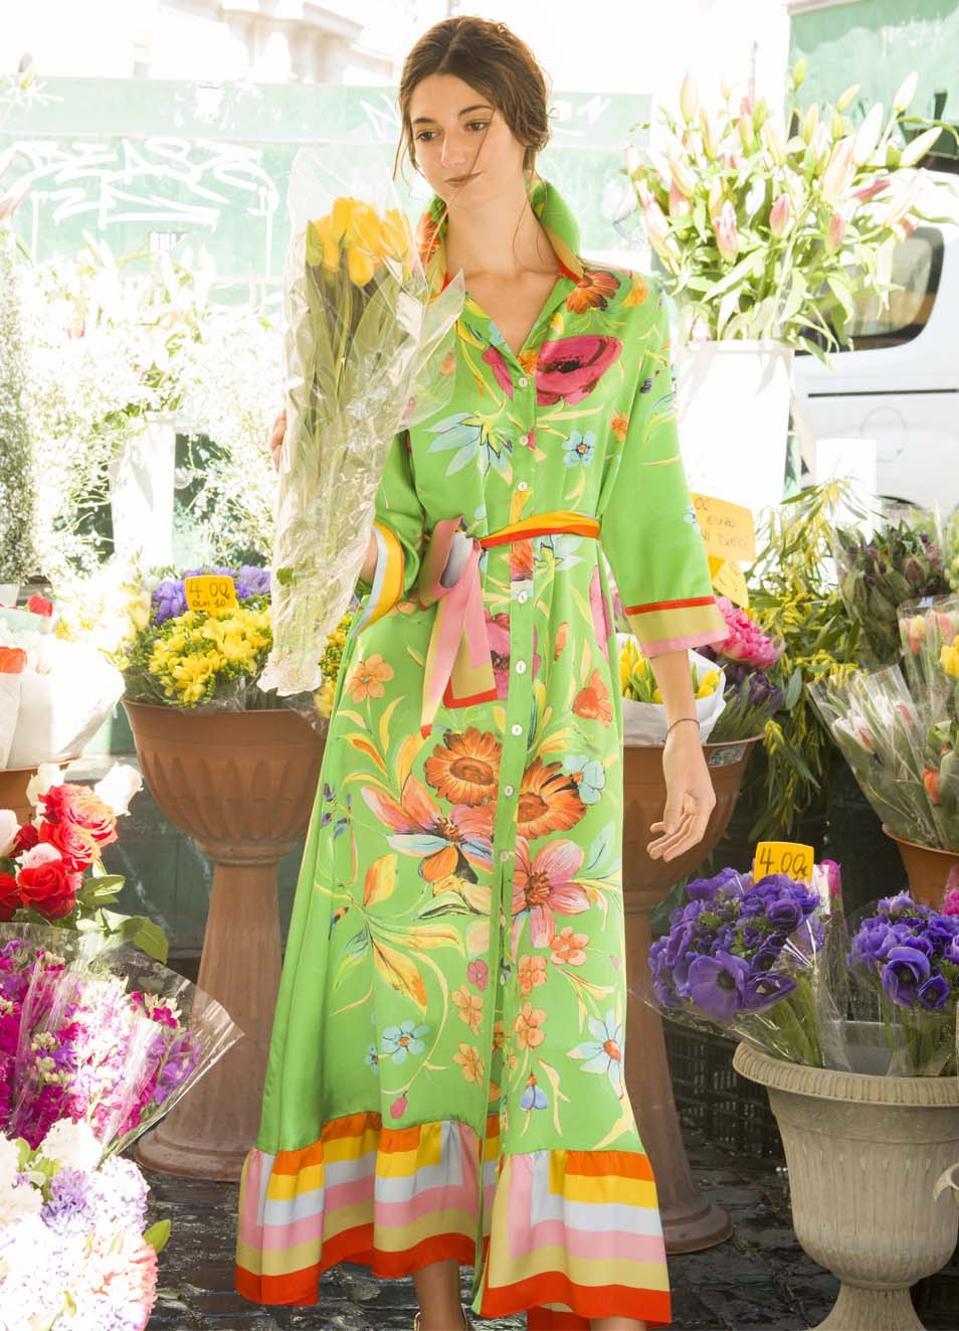 green silk dress with flowers